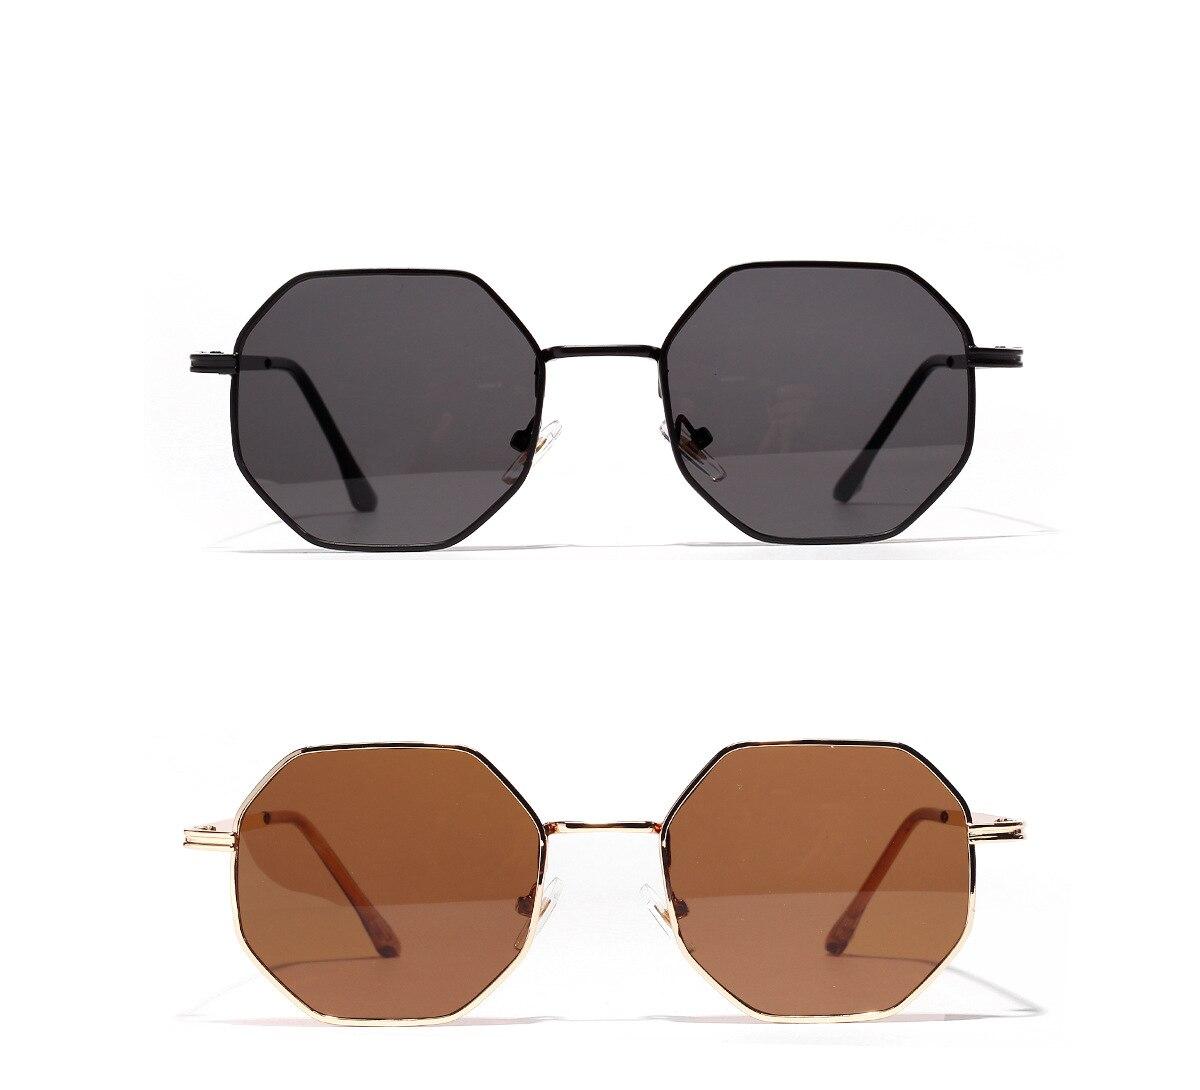 Women's Polygonal Shaped Sunglasses